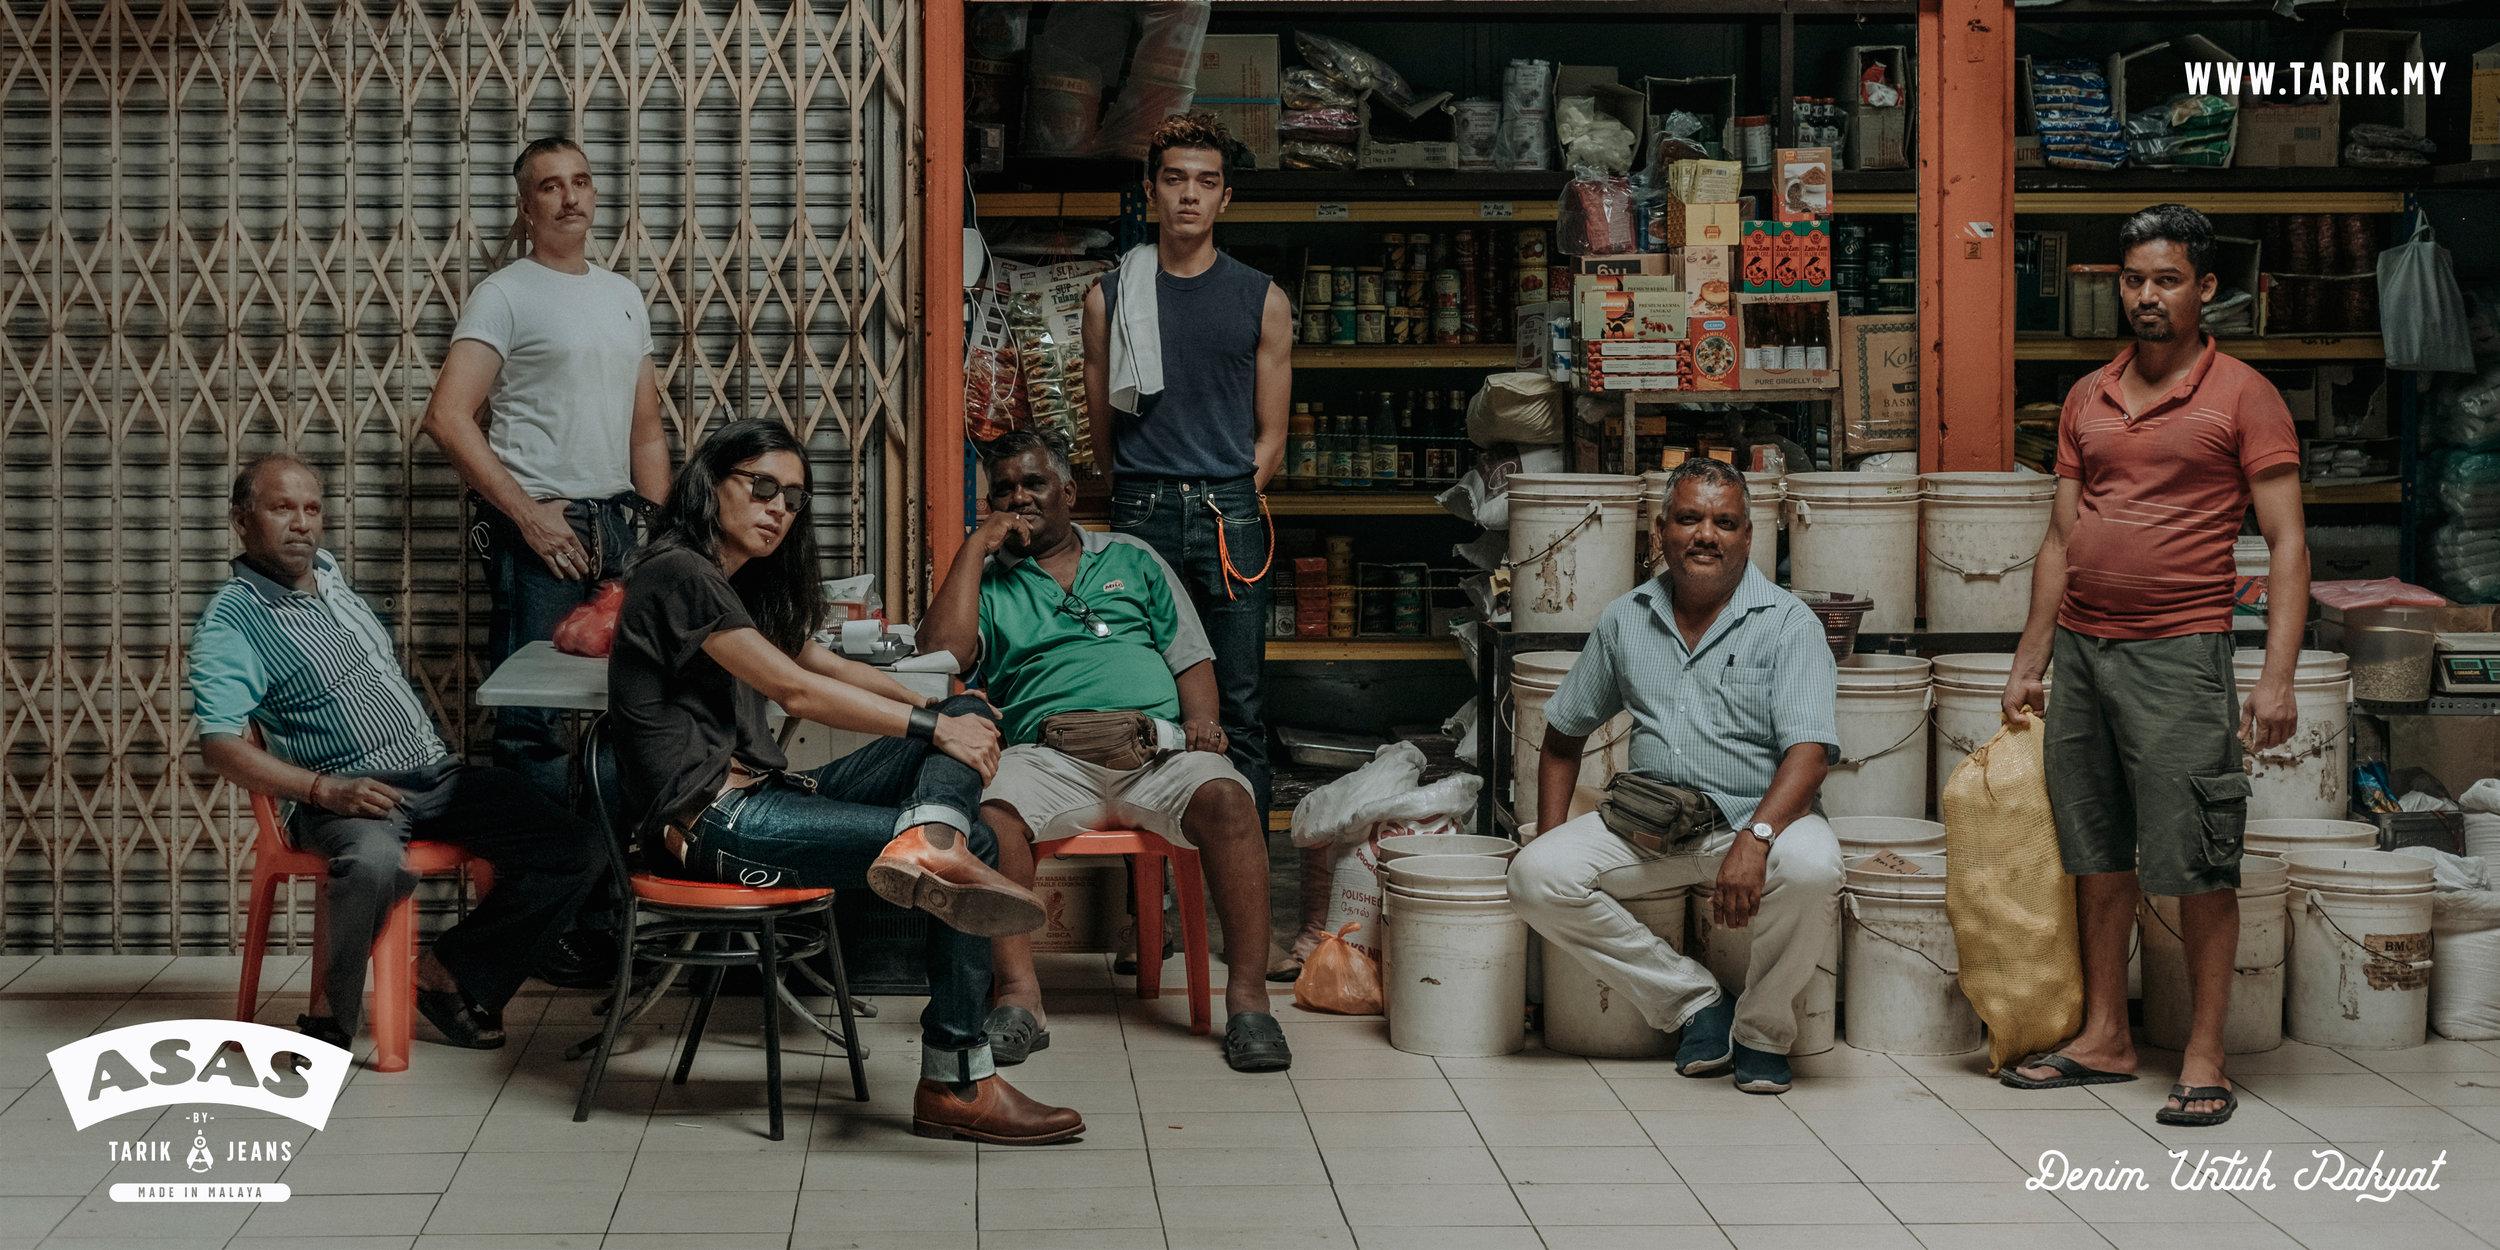 Photography : John Leong , Styling : Jiman Casabancas of Tarik Jeans Models : Al Adam, Joe TigaMoto and Julian Lim , Guest appearance by the local heroes of PJ Old Town Market